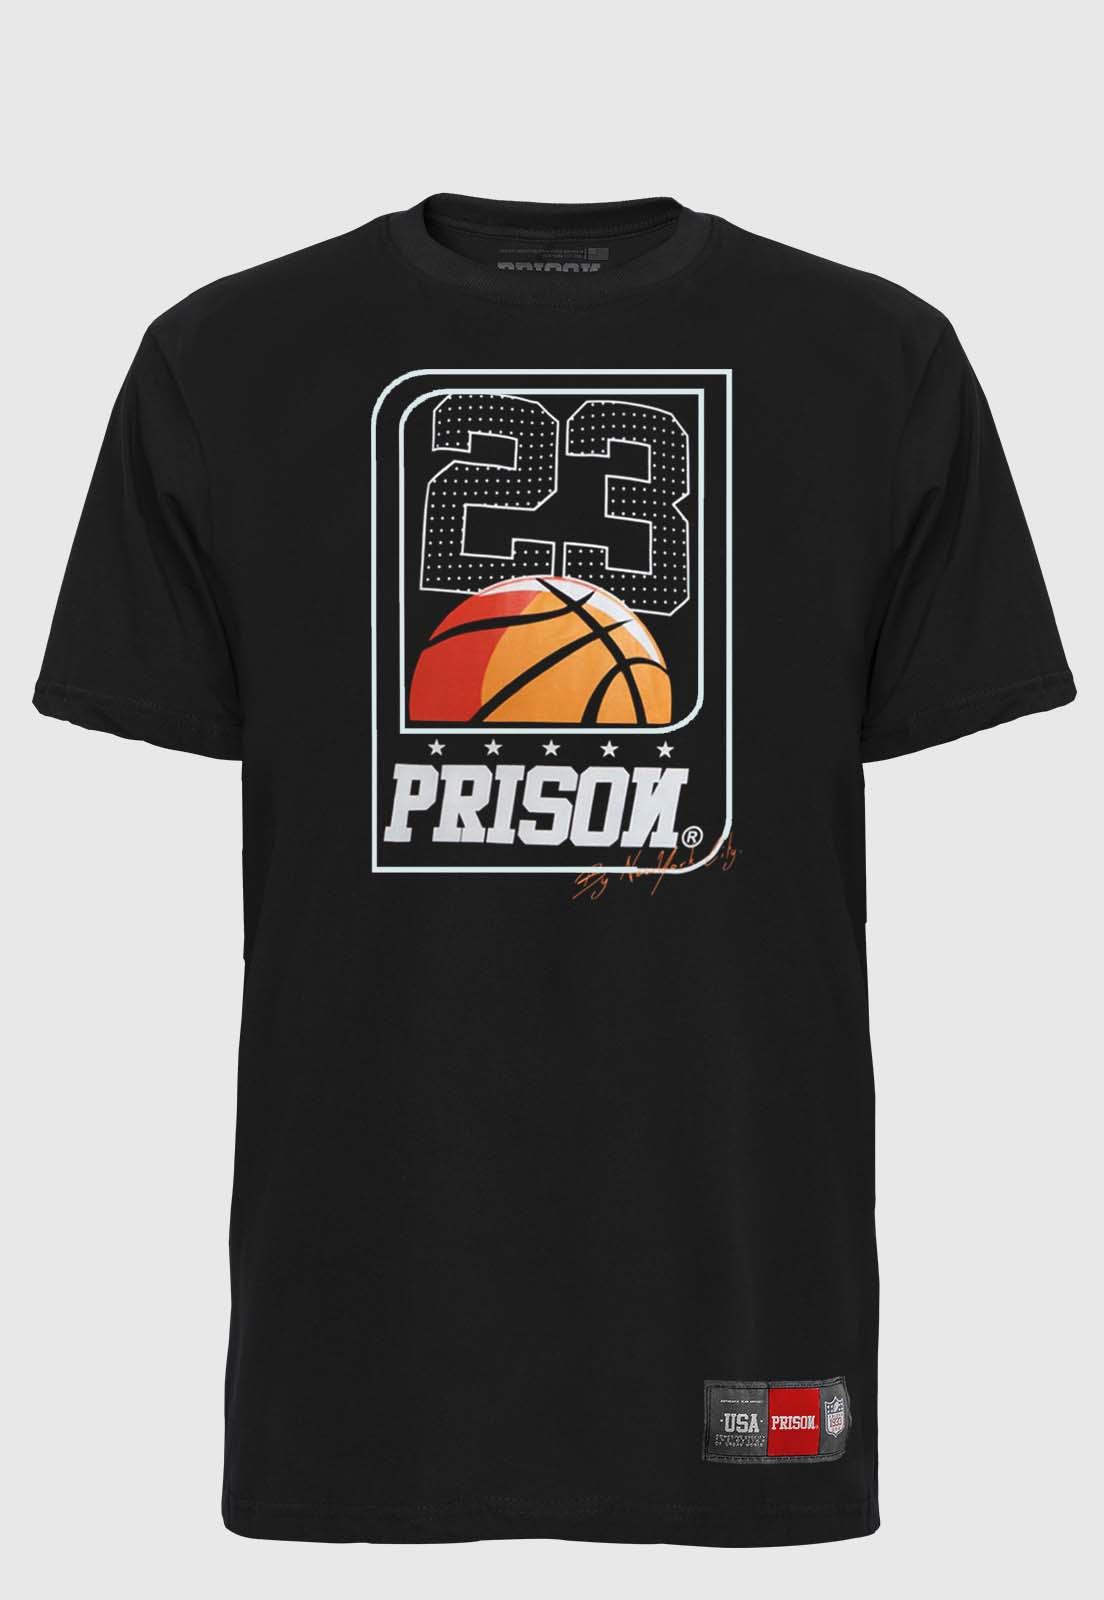 Camiseta Streetwear Prison Basketball Card 23